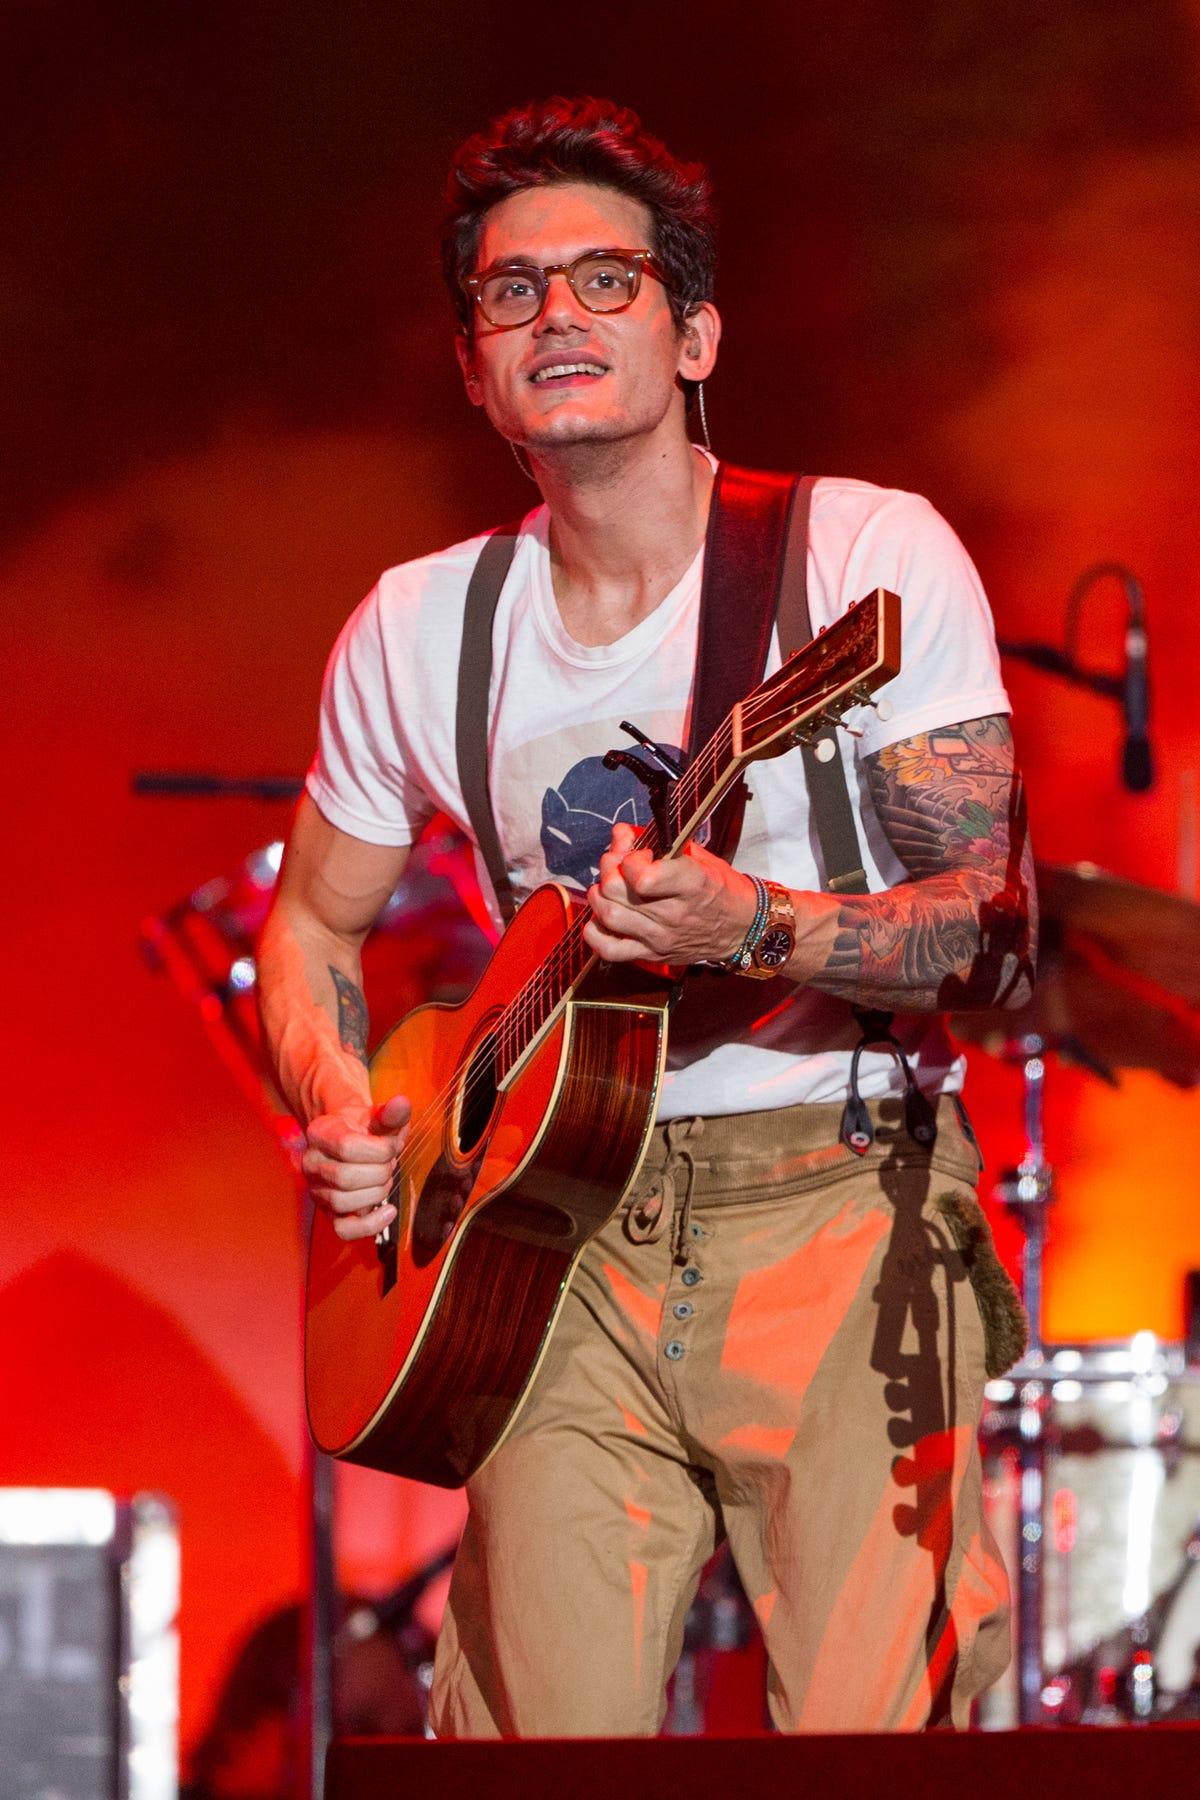 Essential John Mayer: 10 best songs